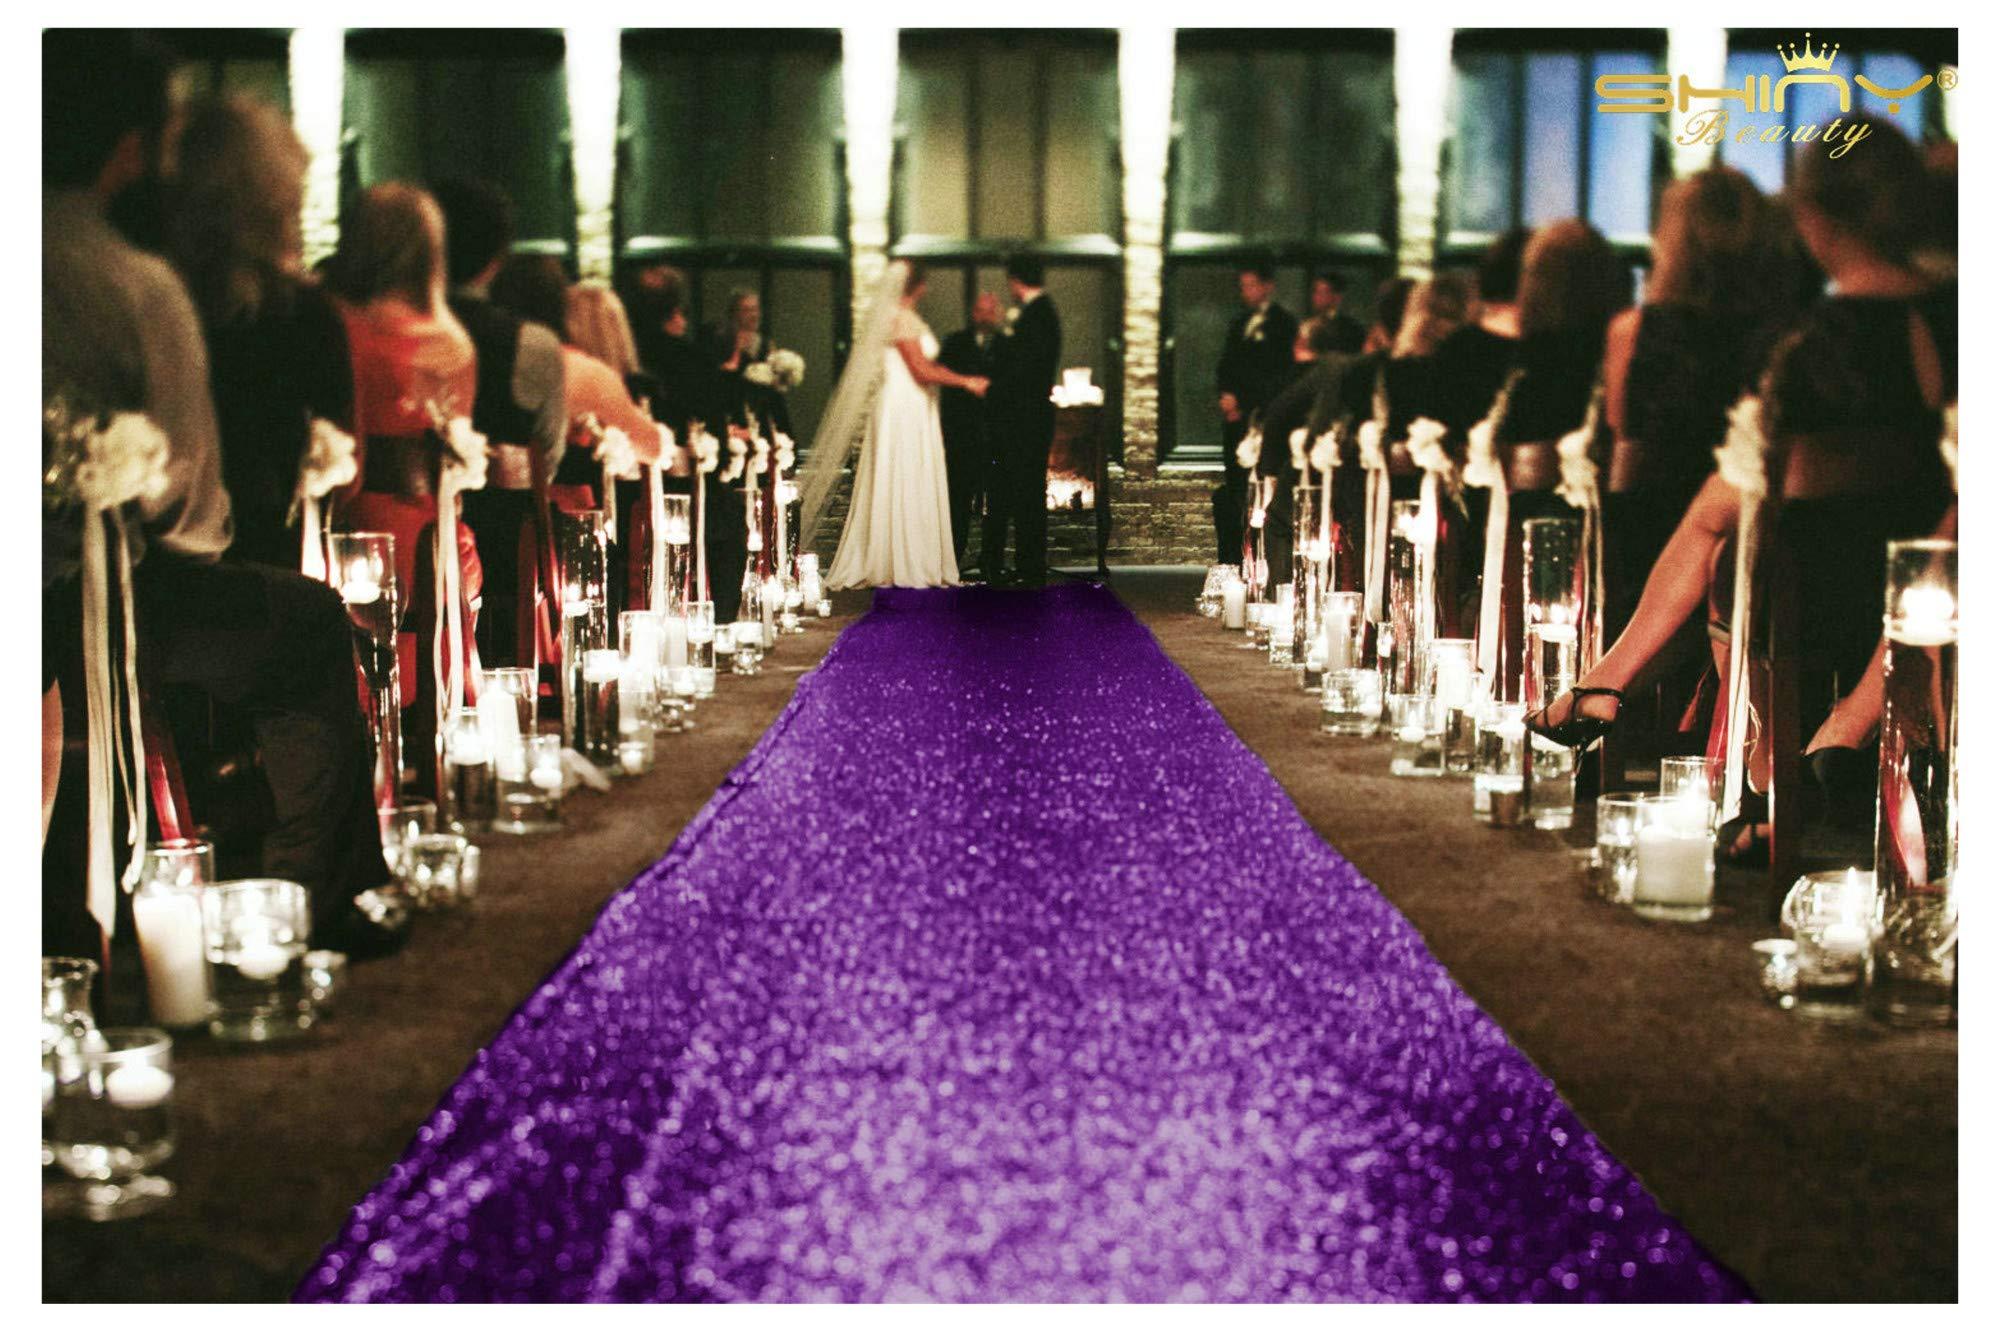 ShinyBeauty Purple Runner for The Bride 4FTx55FT Sequin Aisle Wedding Isle Runner Outdoor Royal Purple Carpet Runner for Party N115